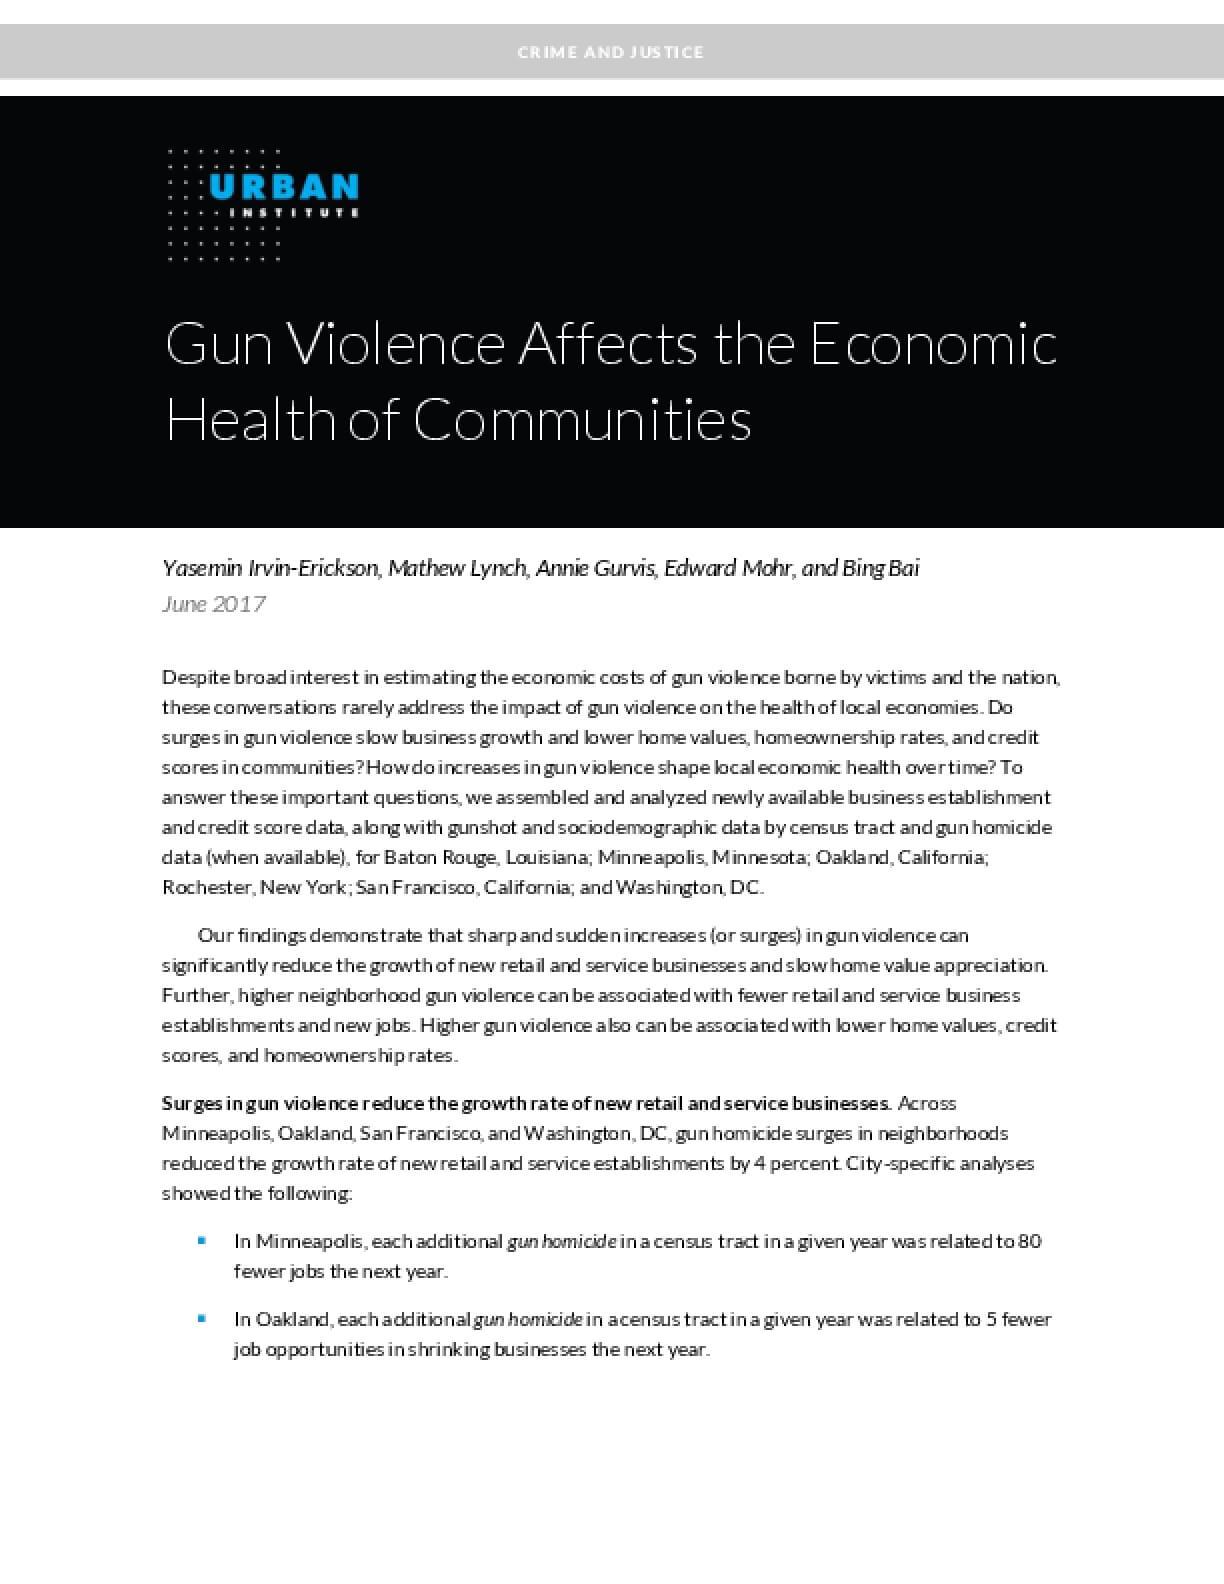 Gun Violence Affects the Economic Health of Communities